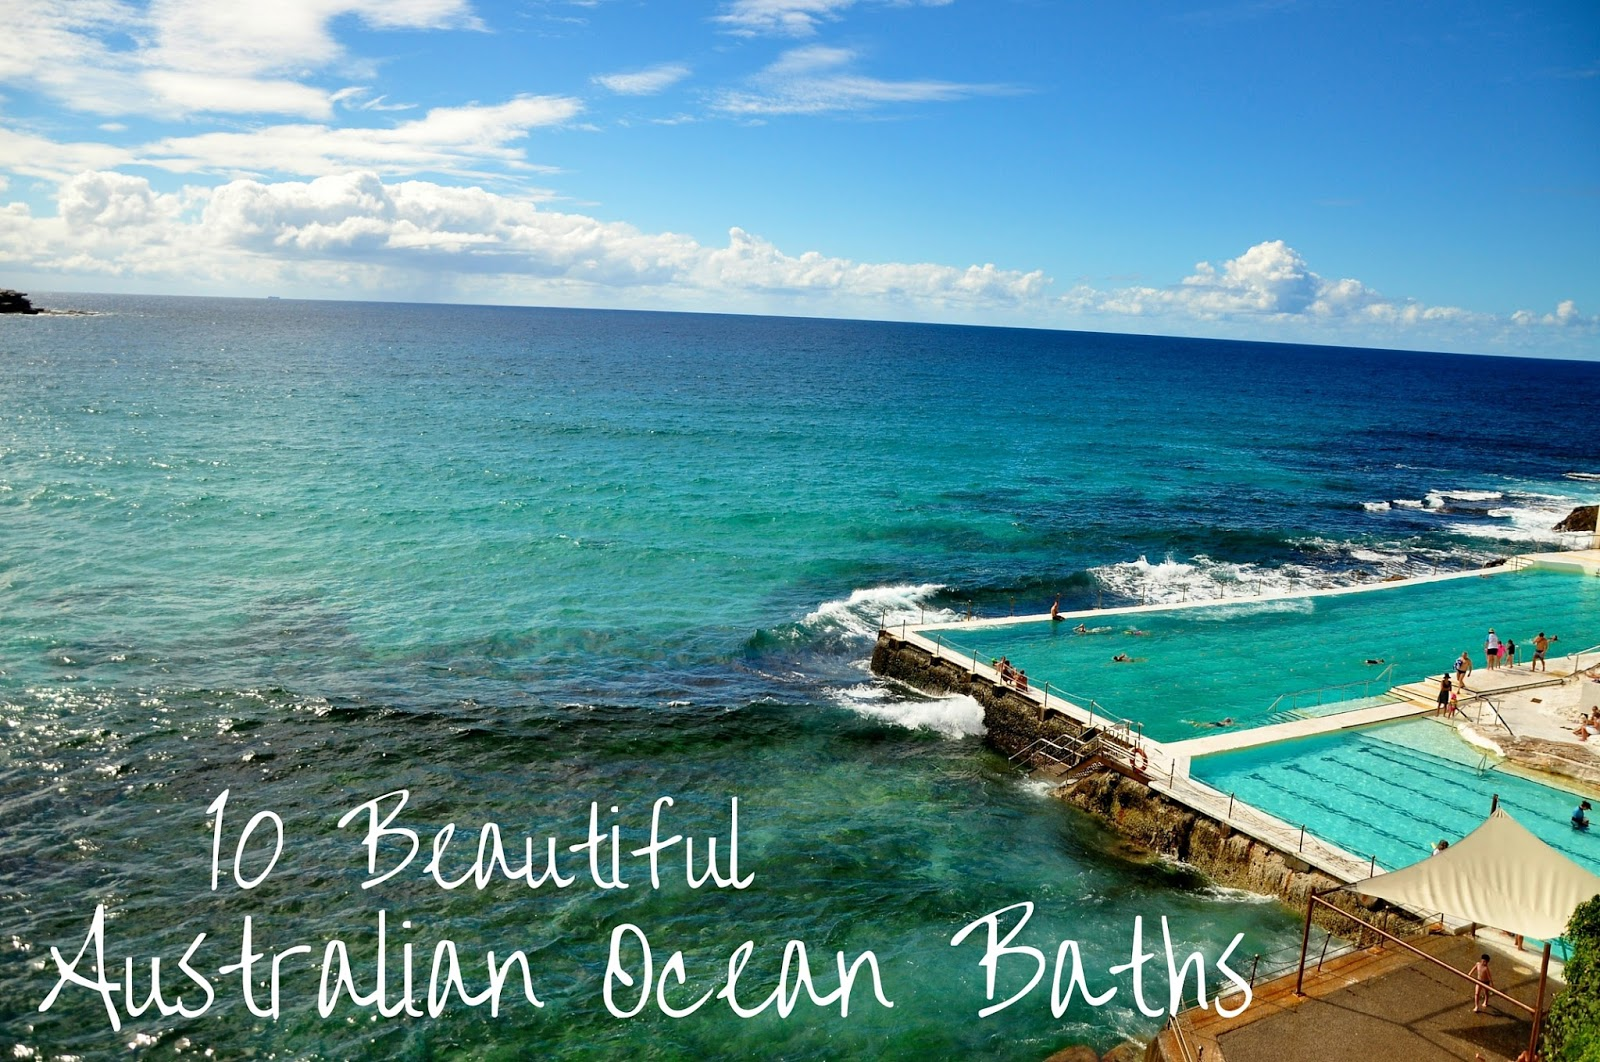 10 Beautiful Australian Ocean Baths